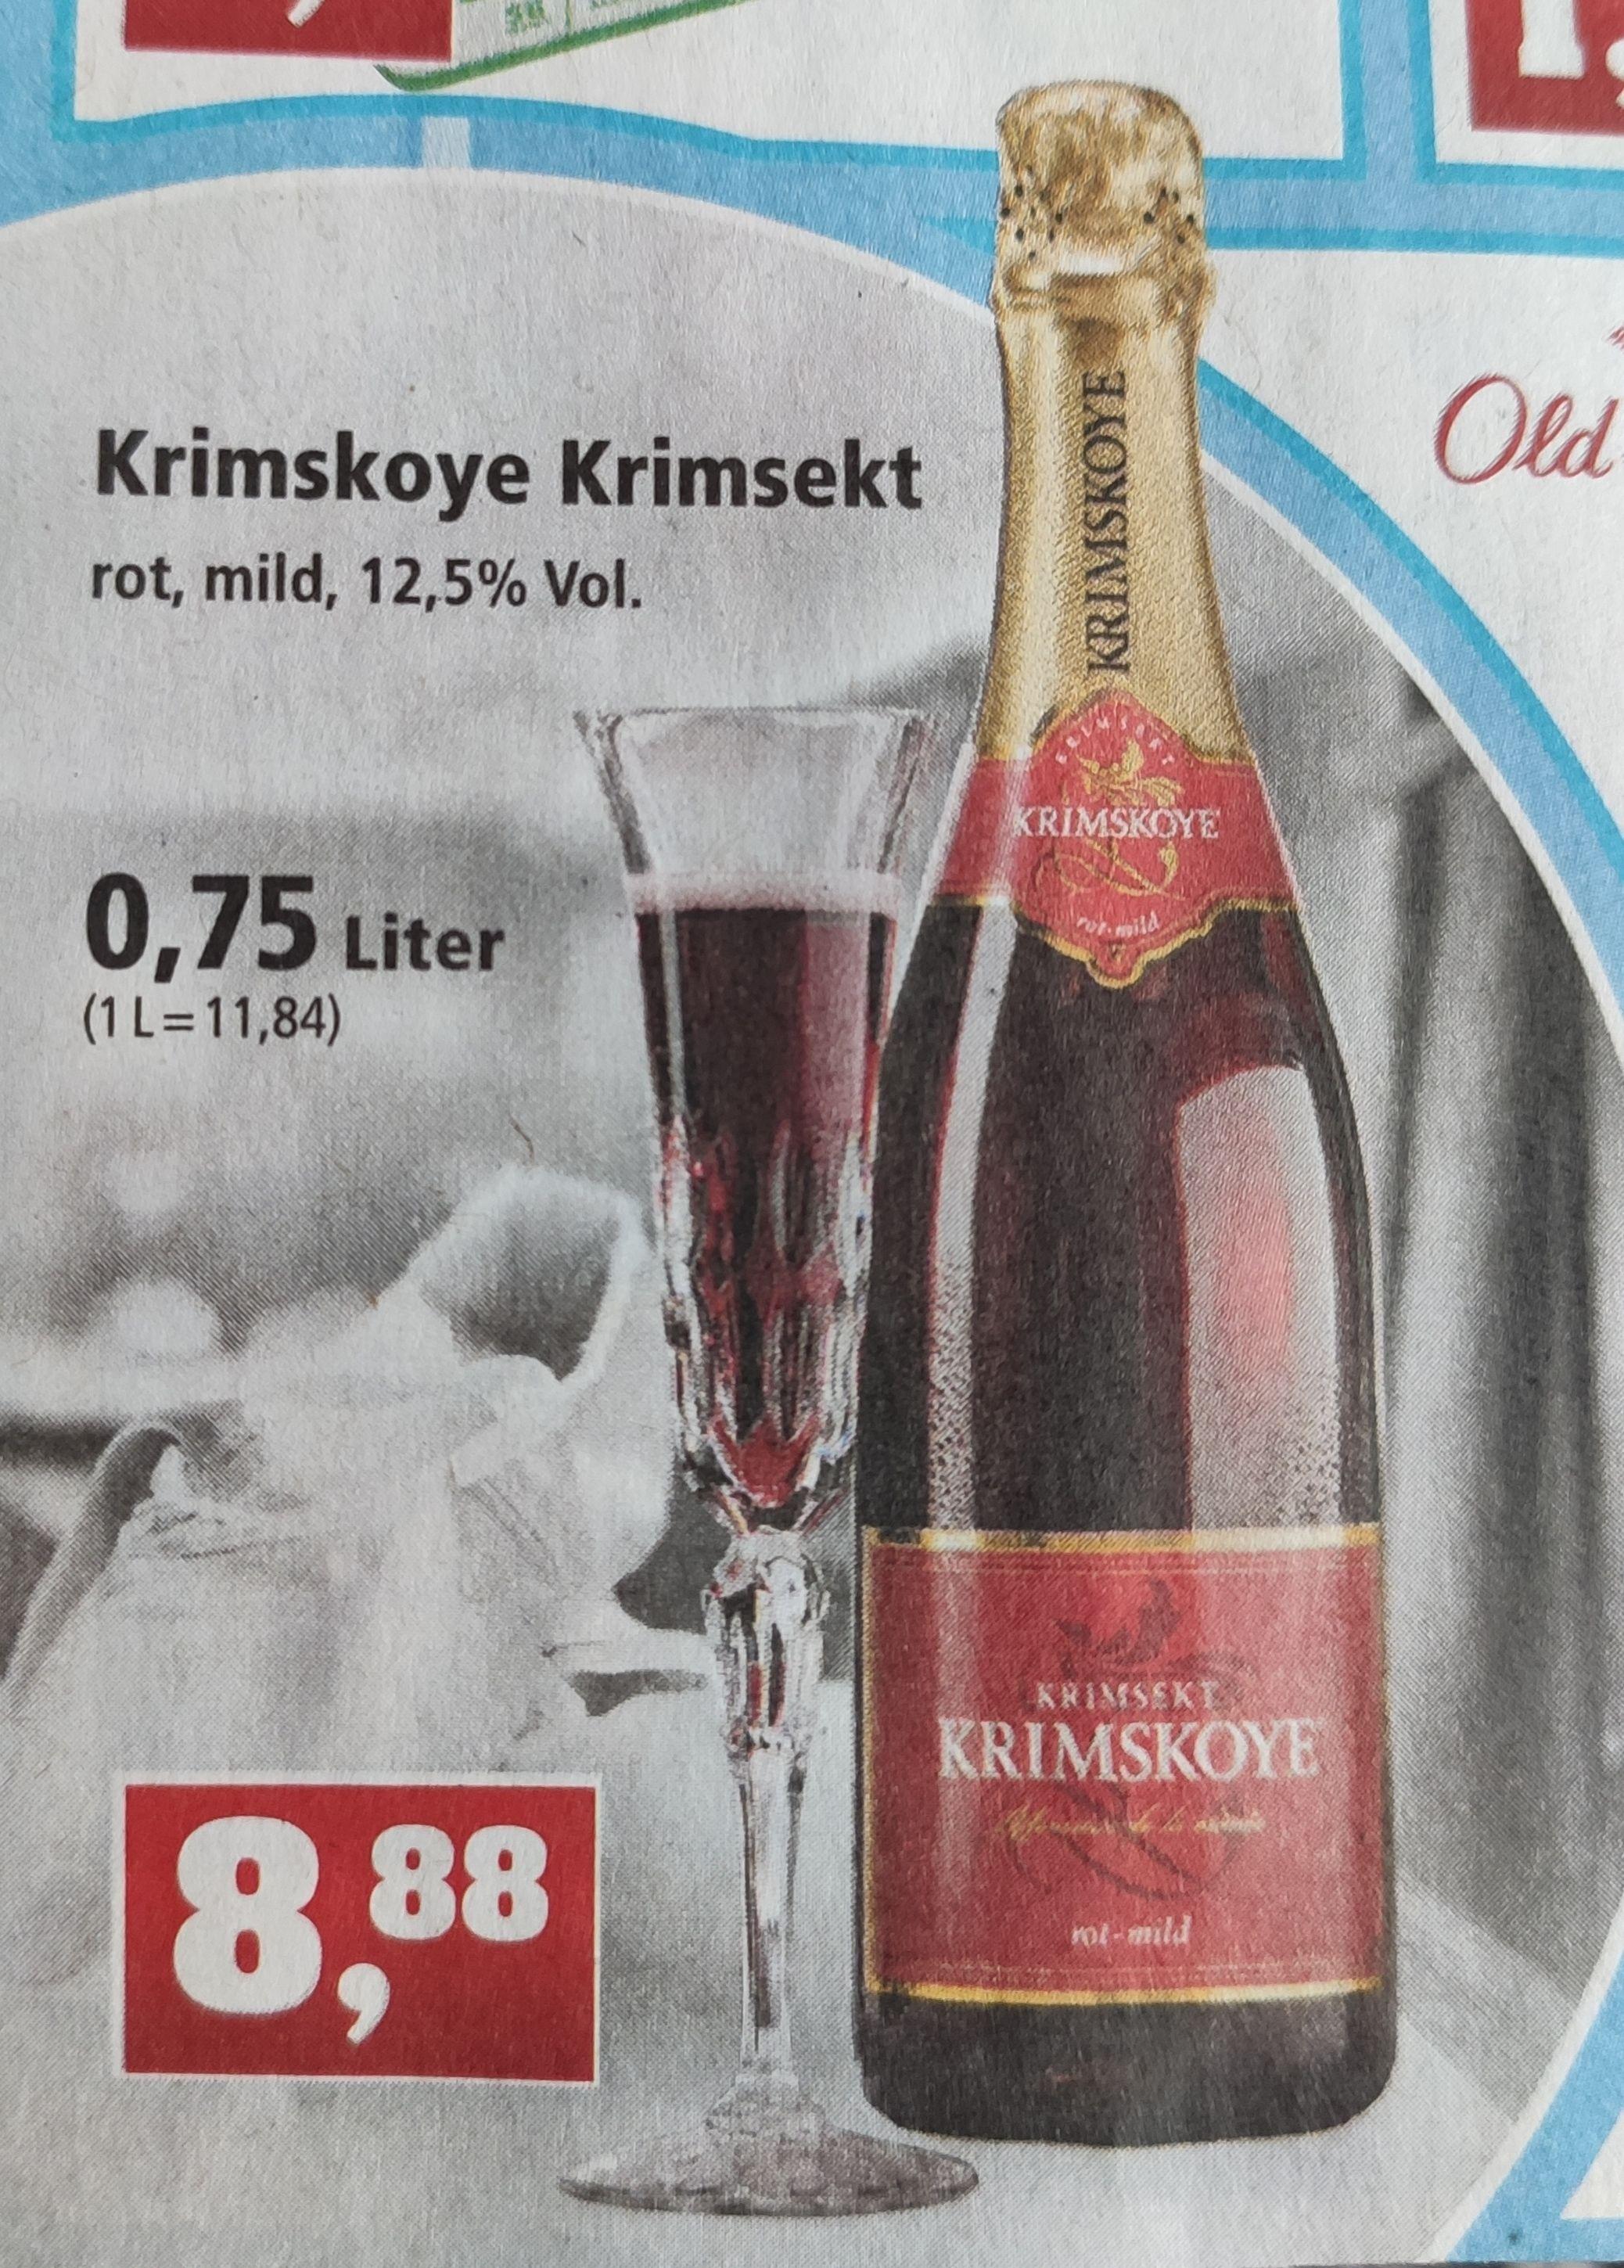 [Thomas Philipps] Krimsekt Krimskoye rot mild im Angebot